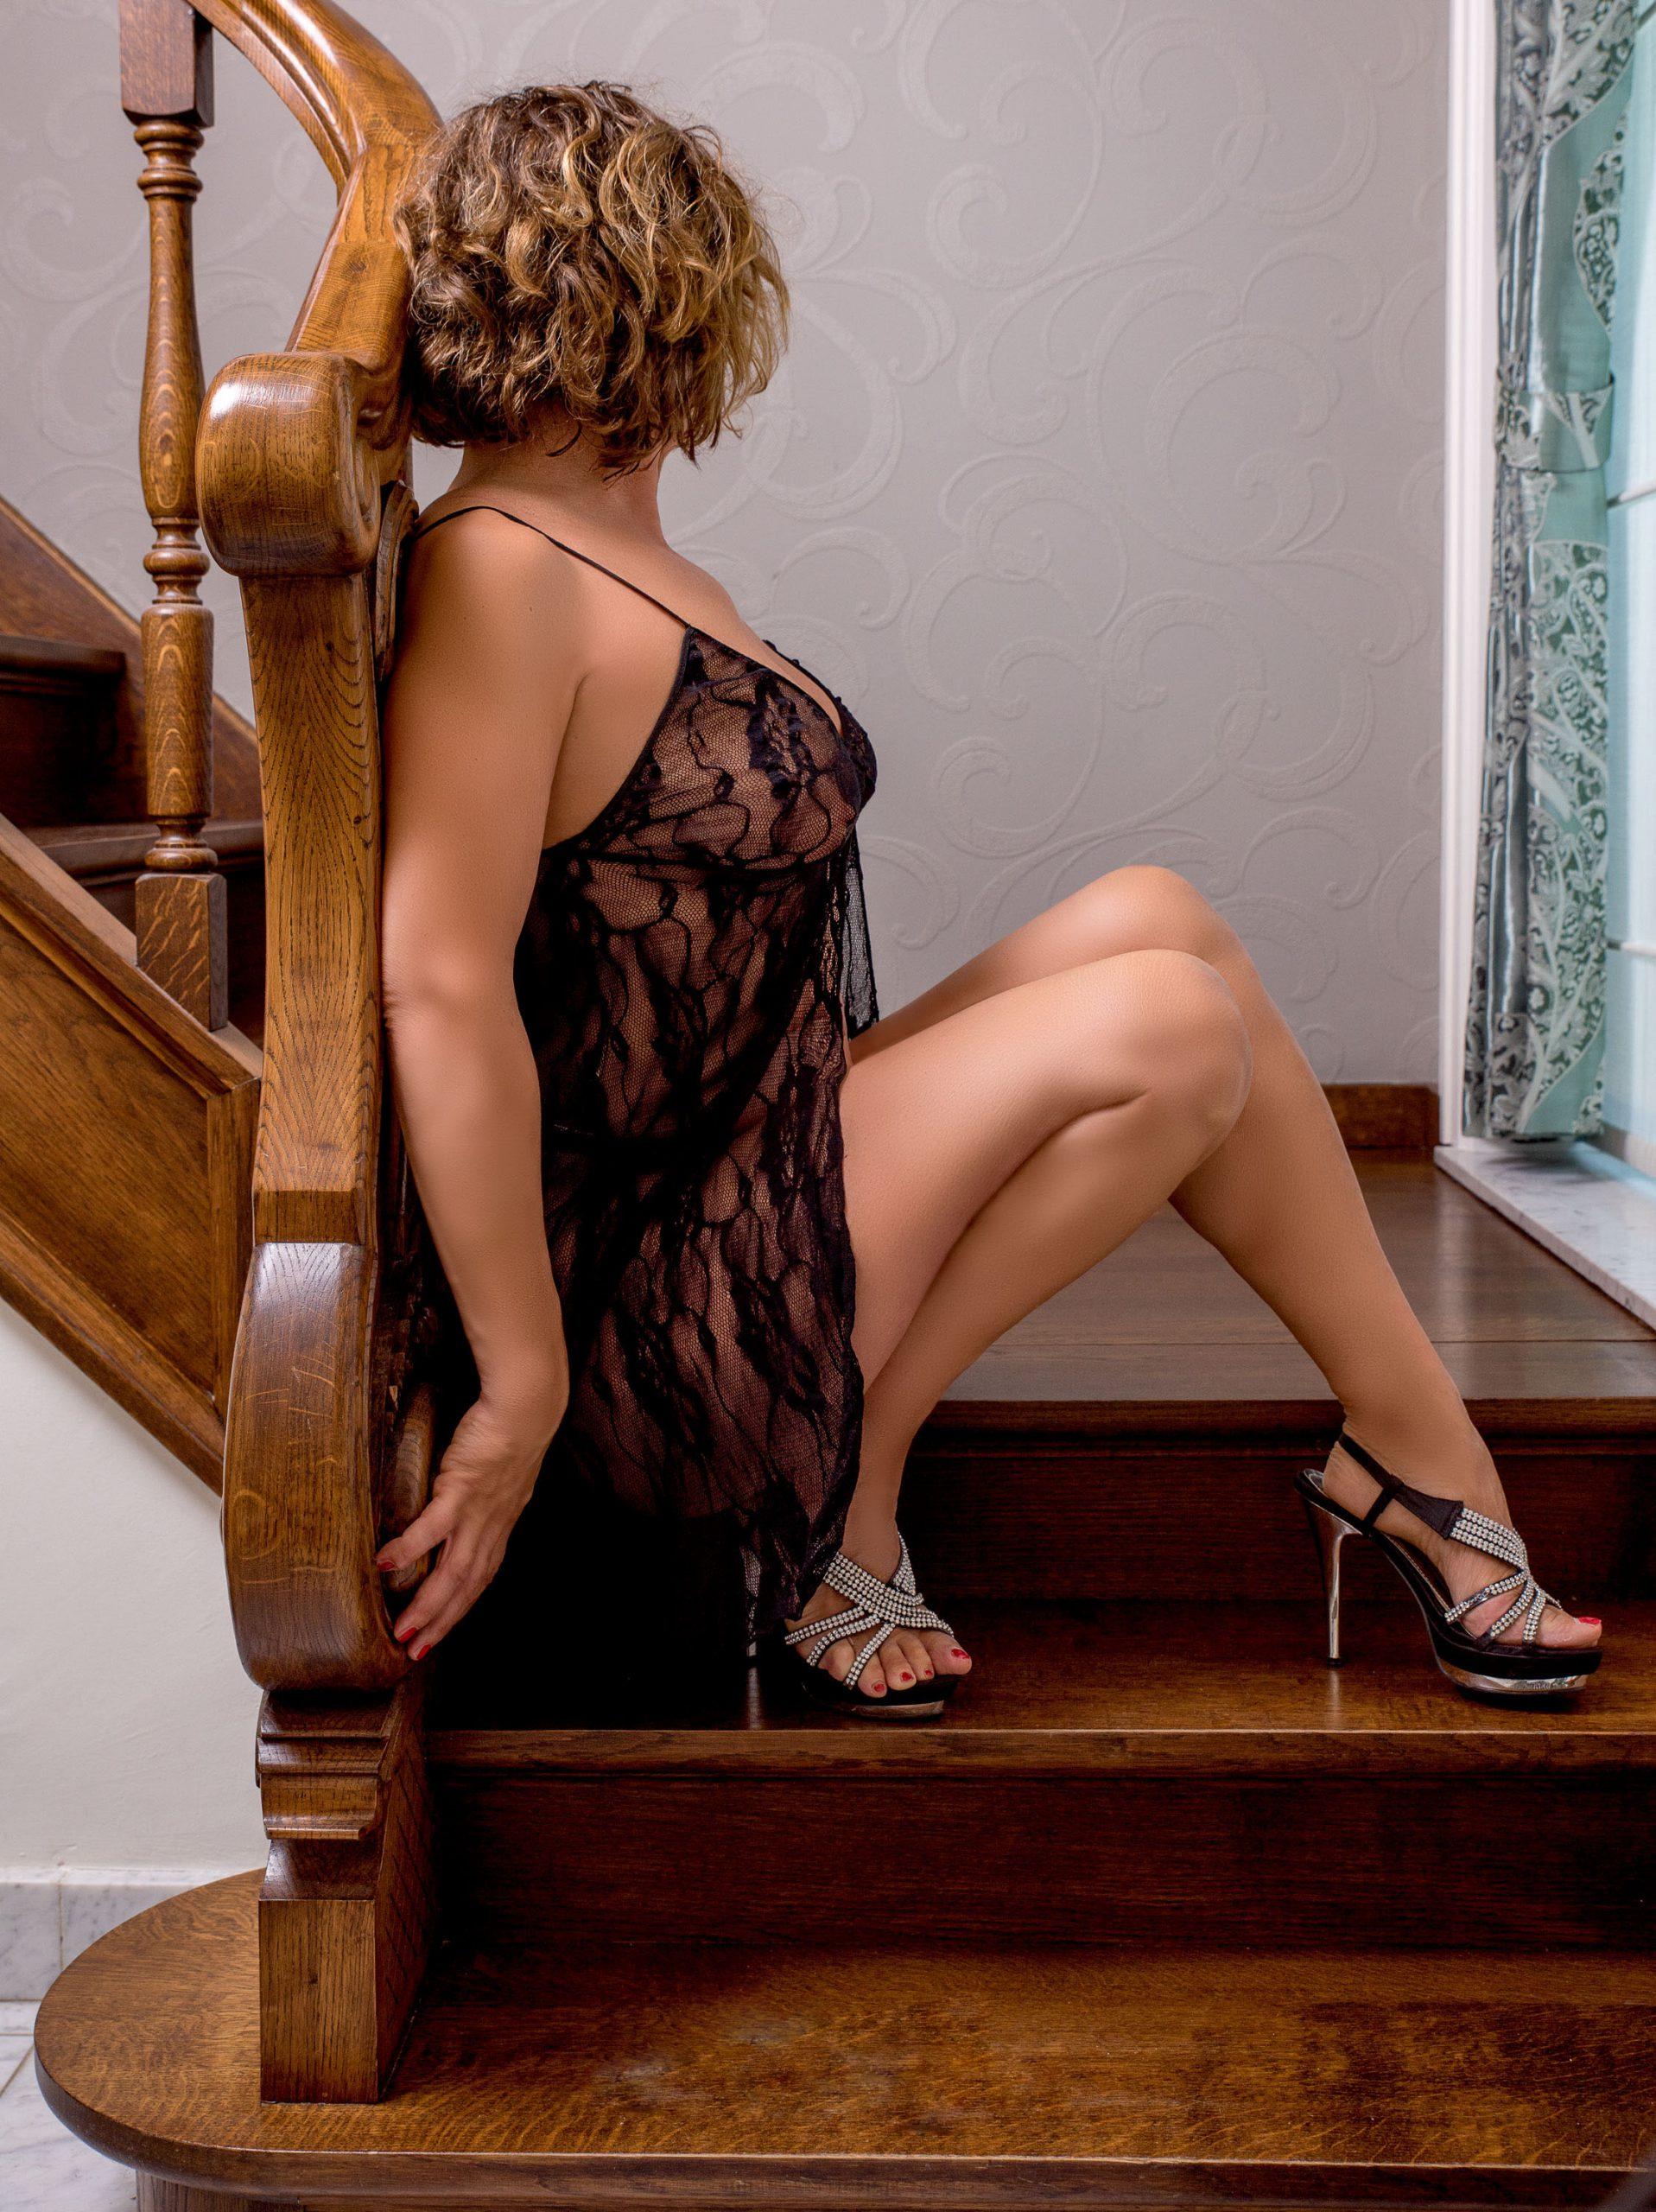 Penismassage en erotische massage Breda